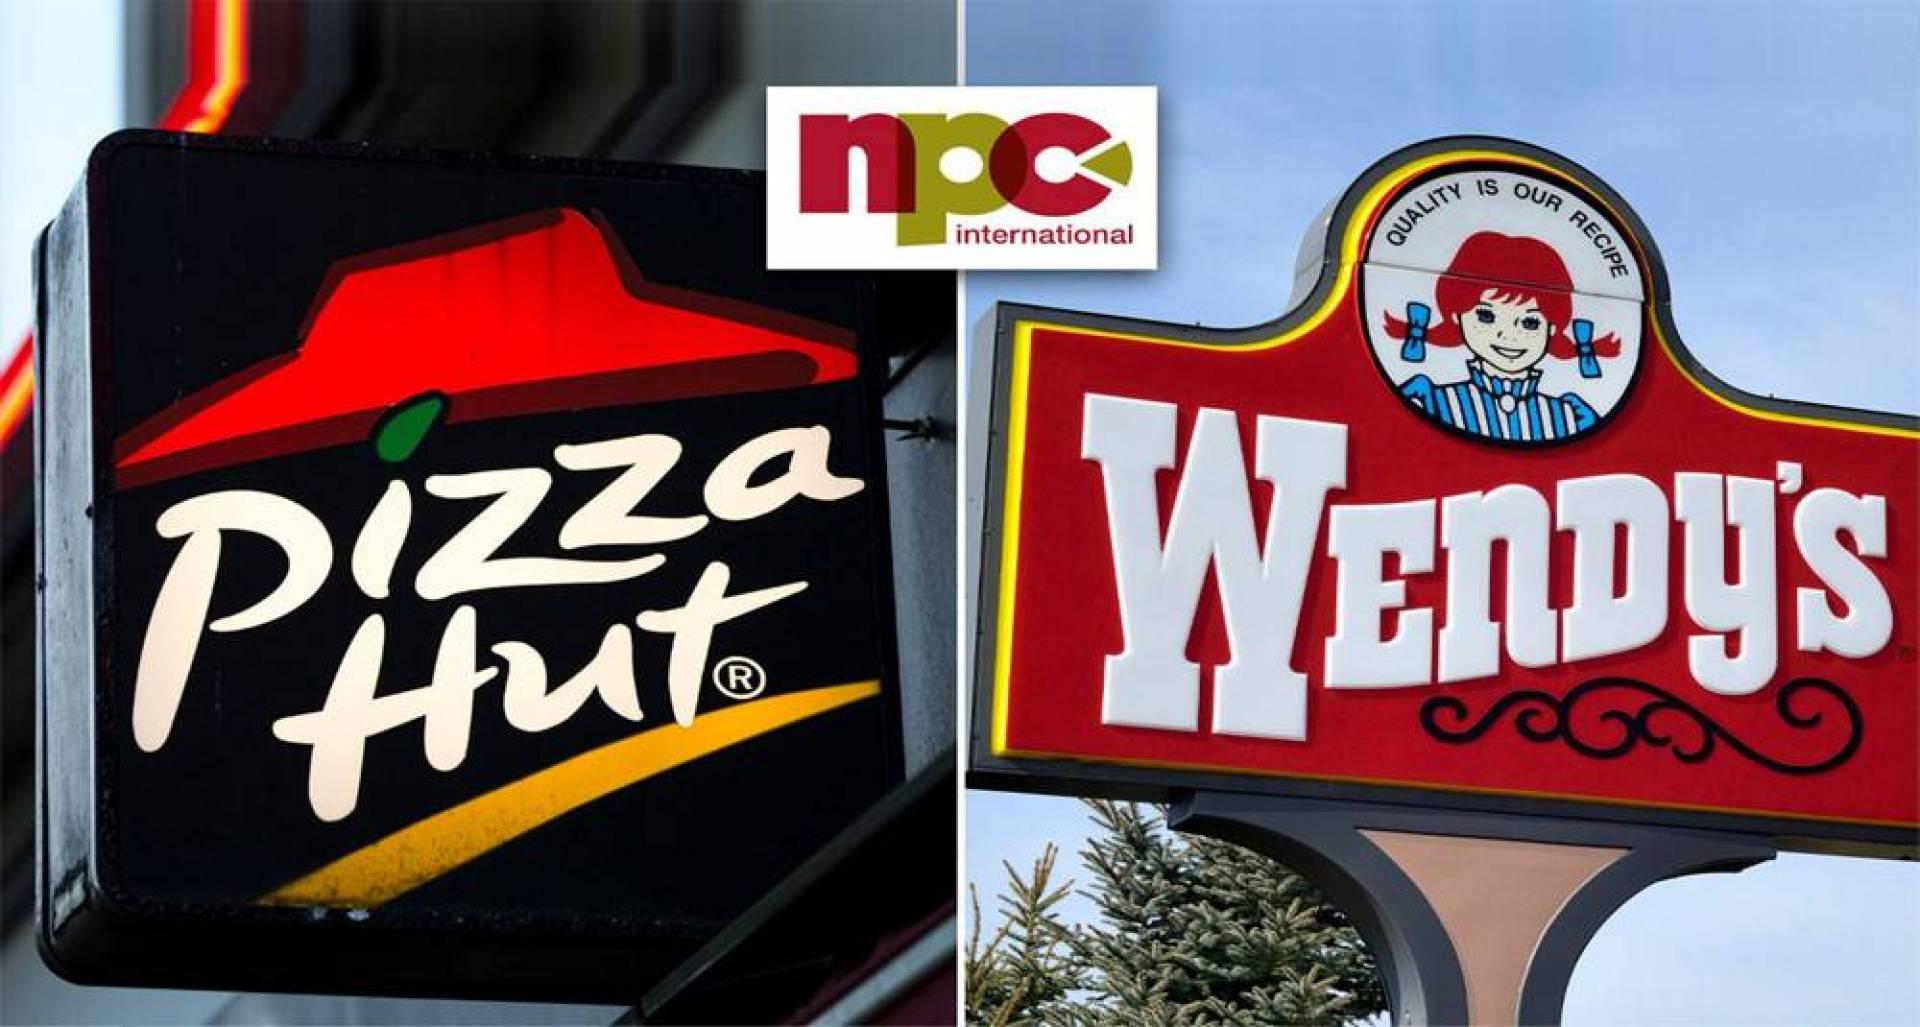 Untitled 1 497692 highres - مطاعم بيتزا هت تعلن عن إفلاسها بسبب أزمة كورونا